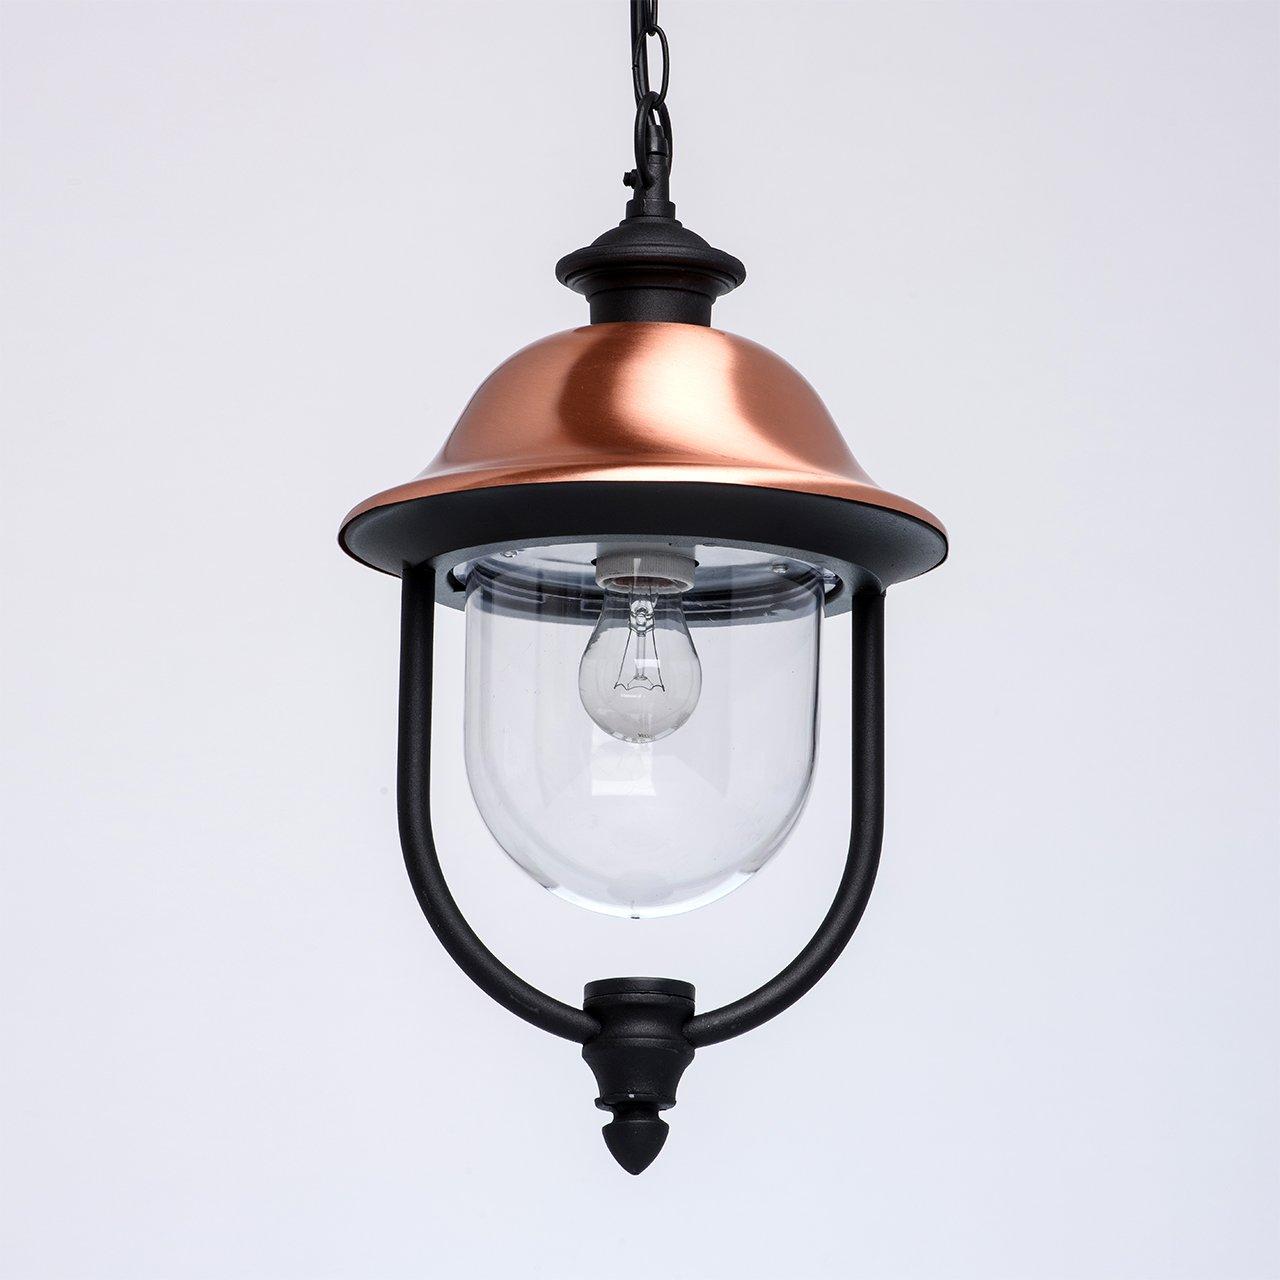 loading zoom olde kichler lights outdoor product manningham products oz ceiling bronze light